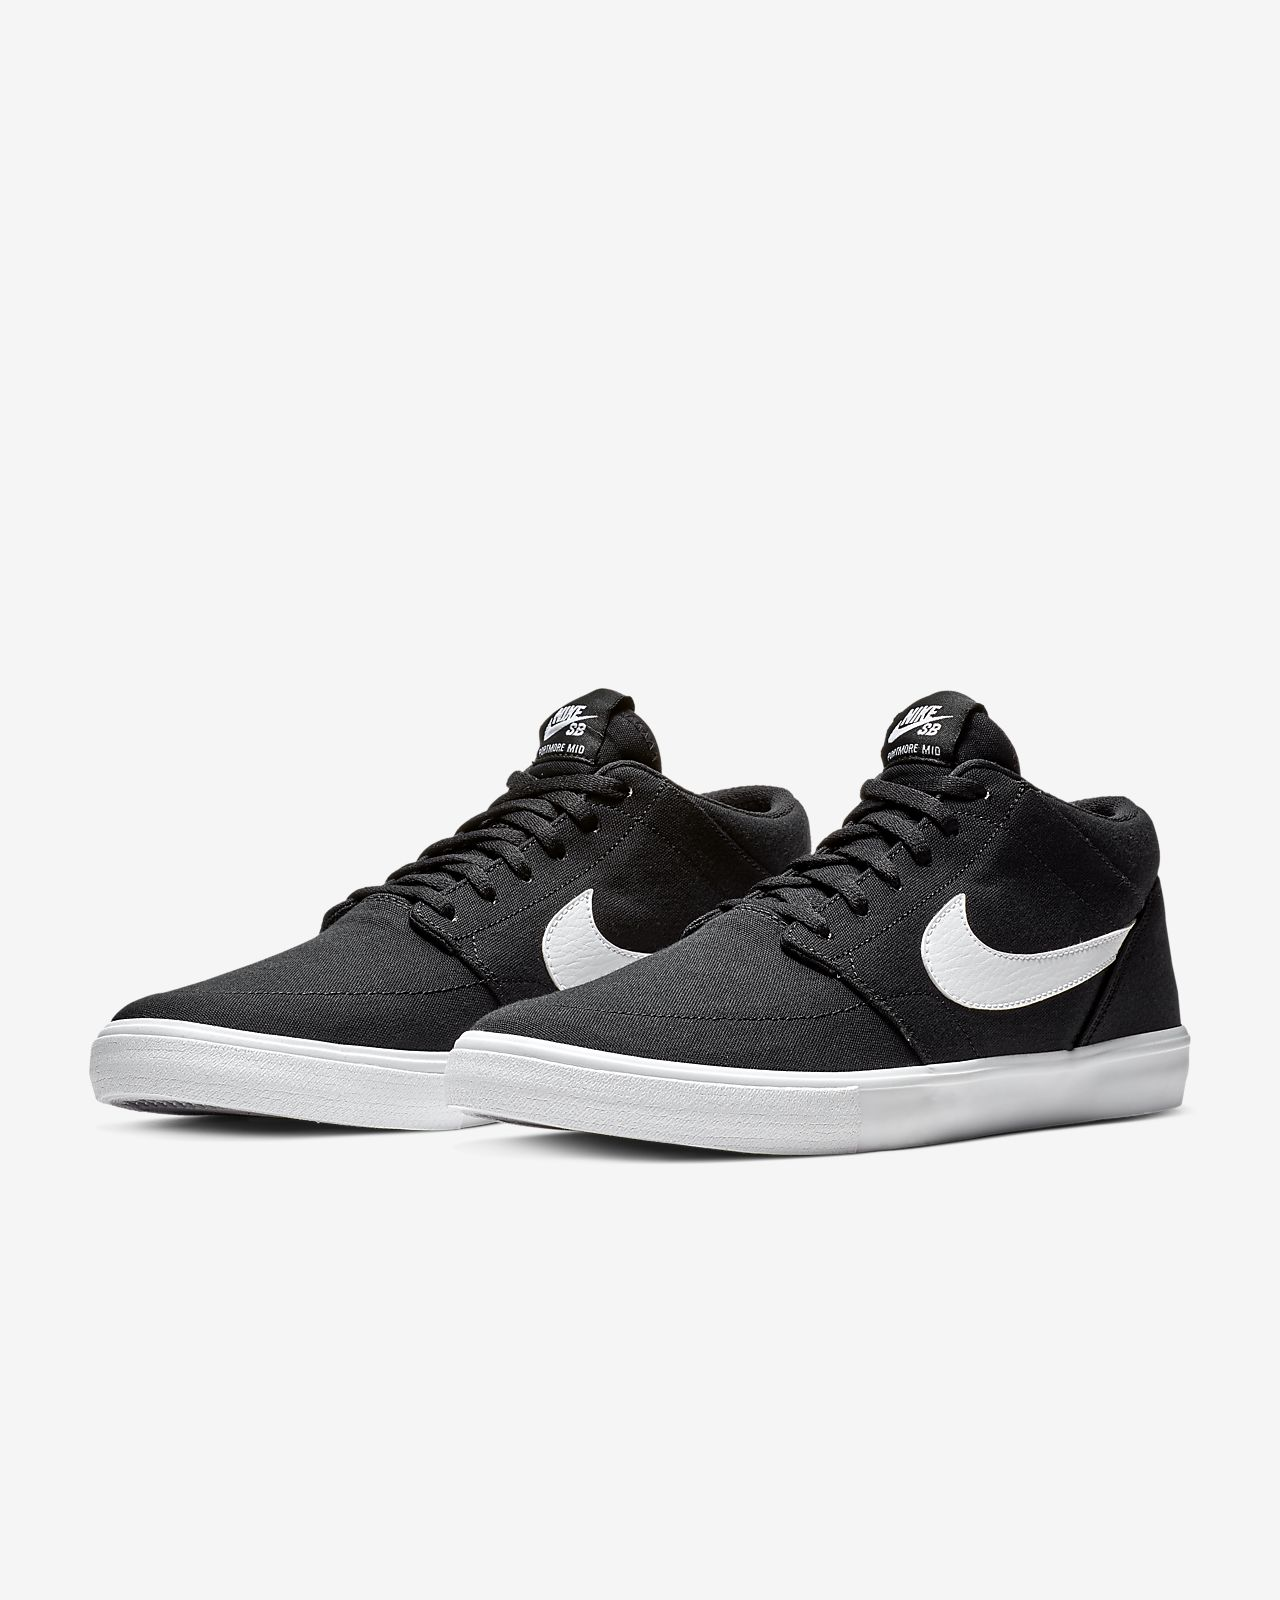 pretty nice 742b0 ba637 ... Nike SB Portmore 2 Solarsoft Mid Canvas Men s Skate Shoe